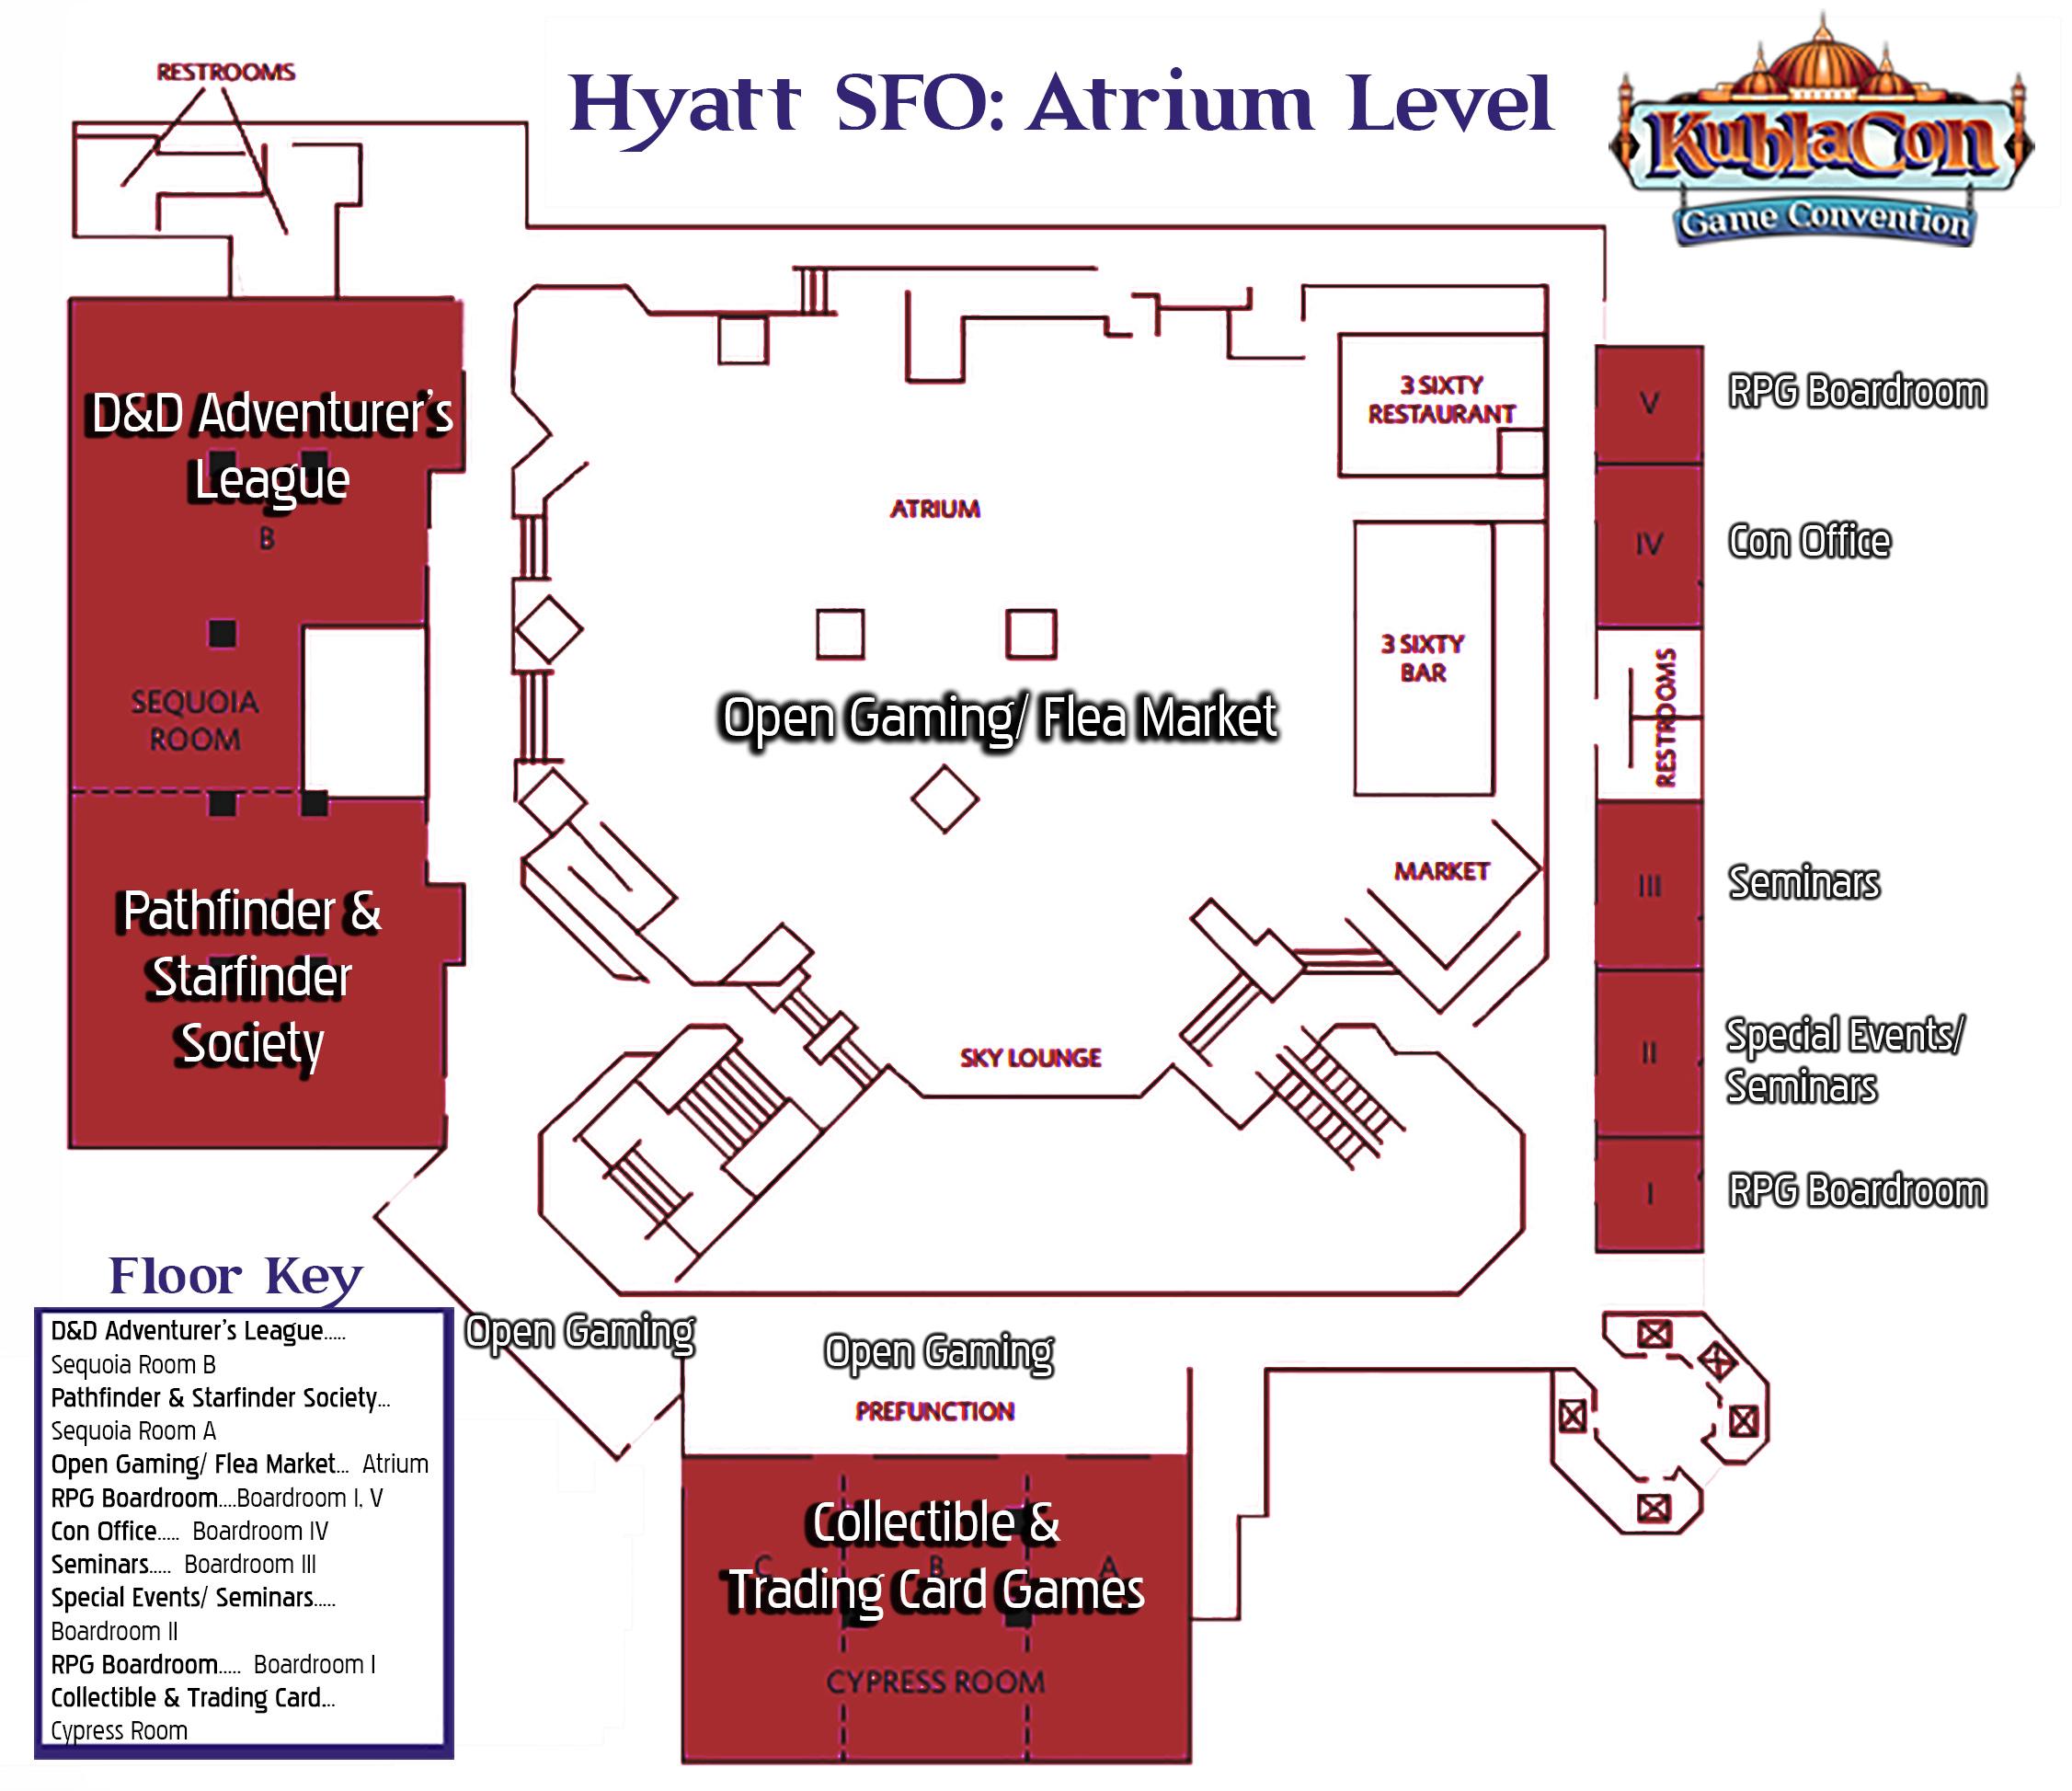 Hyatt SFO Attrium Level